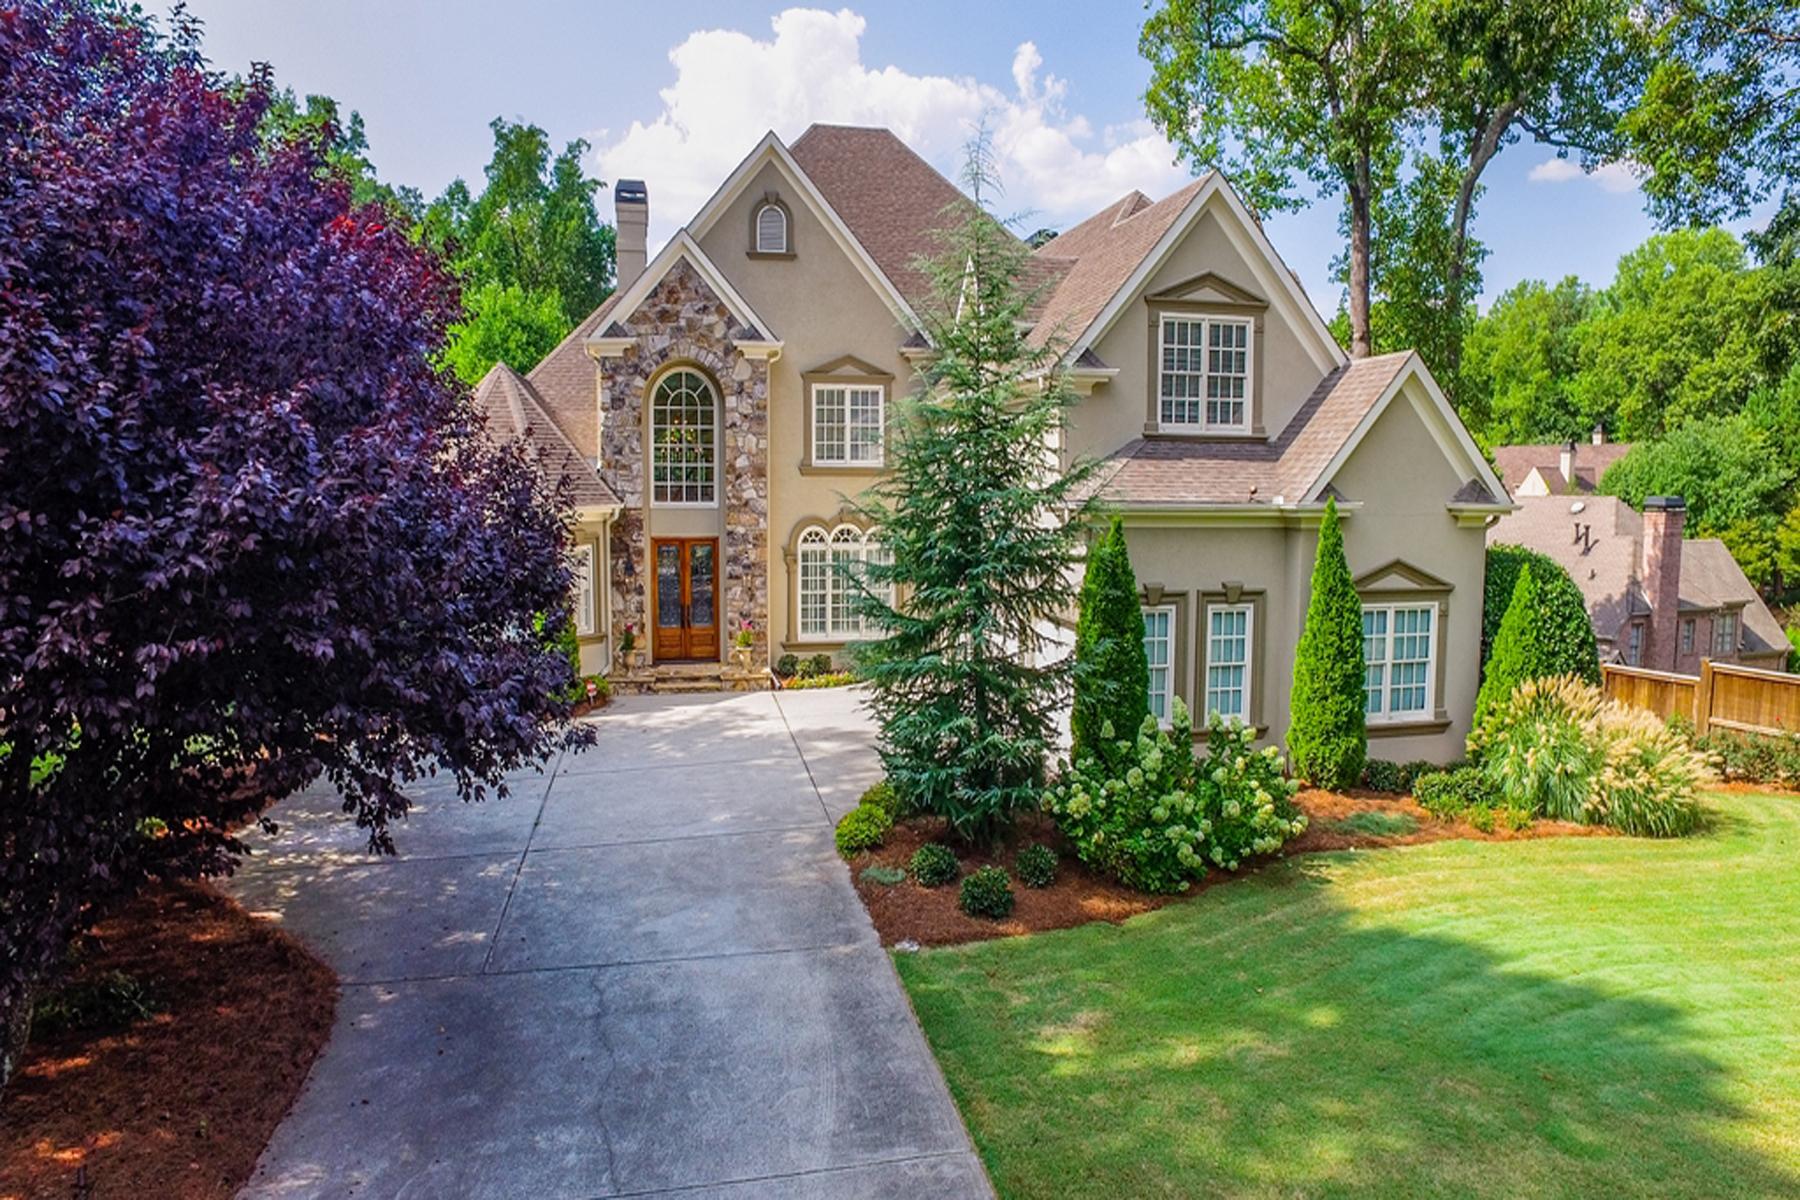 Moradia para Venda às Sandy Springs Home On 1.43 Acres With Finished Basement And Pool 385 Mount Paran Road Atlanta, Geórgia, 30327 Estados Unidos